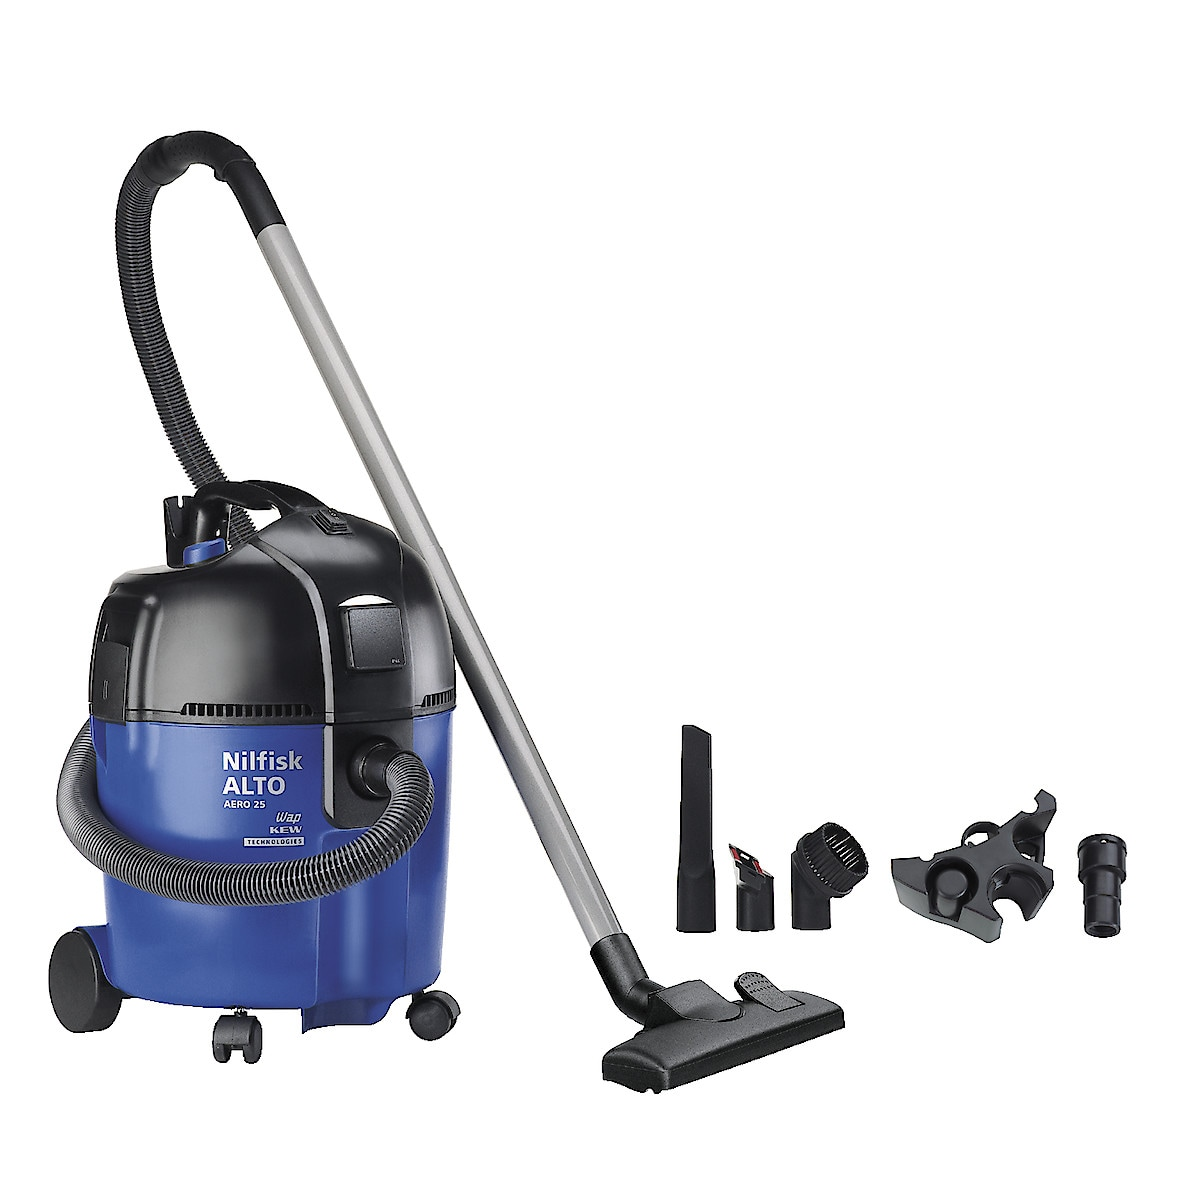 Nilfisk-Alto Aero 25-21 Wet & Dry Vacuum Cleaner